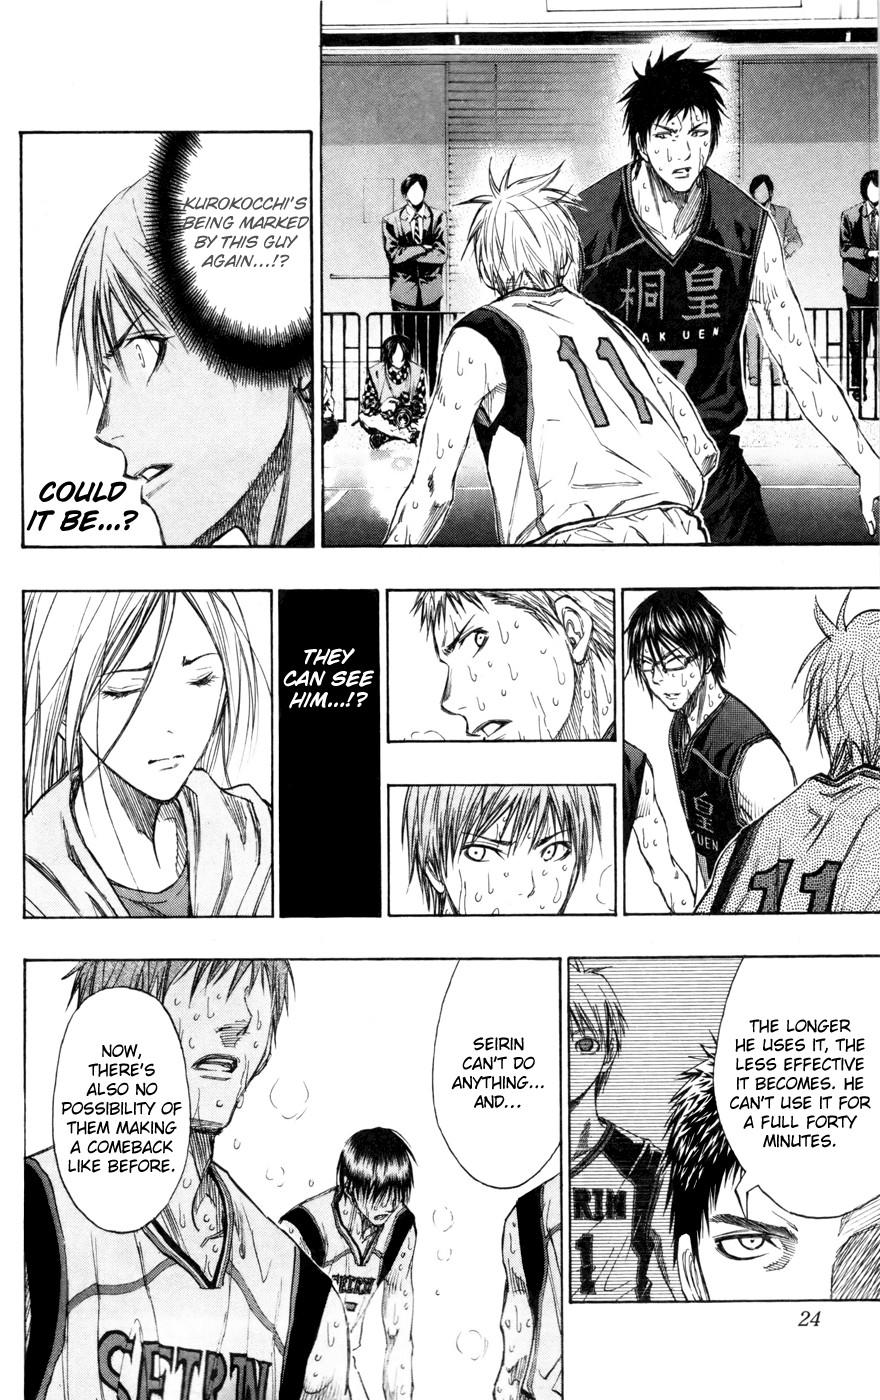 Kuroko no Basket Manga Chapter 127 - Image 24